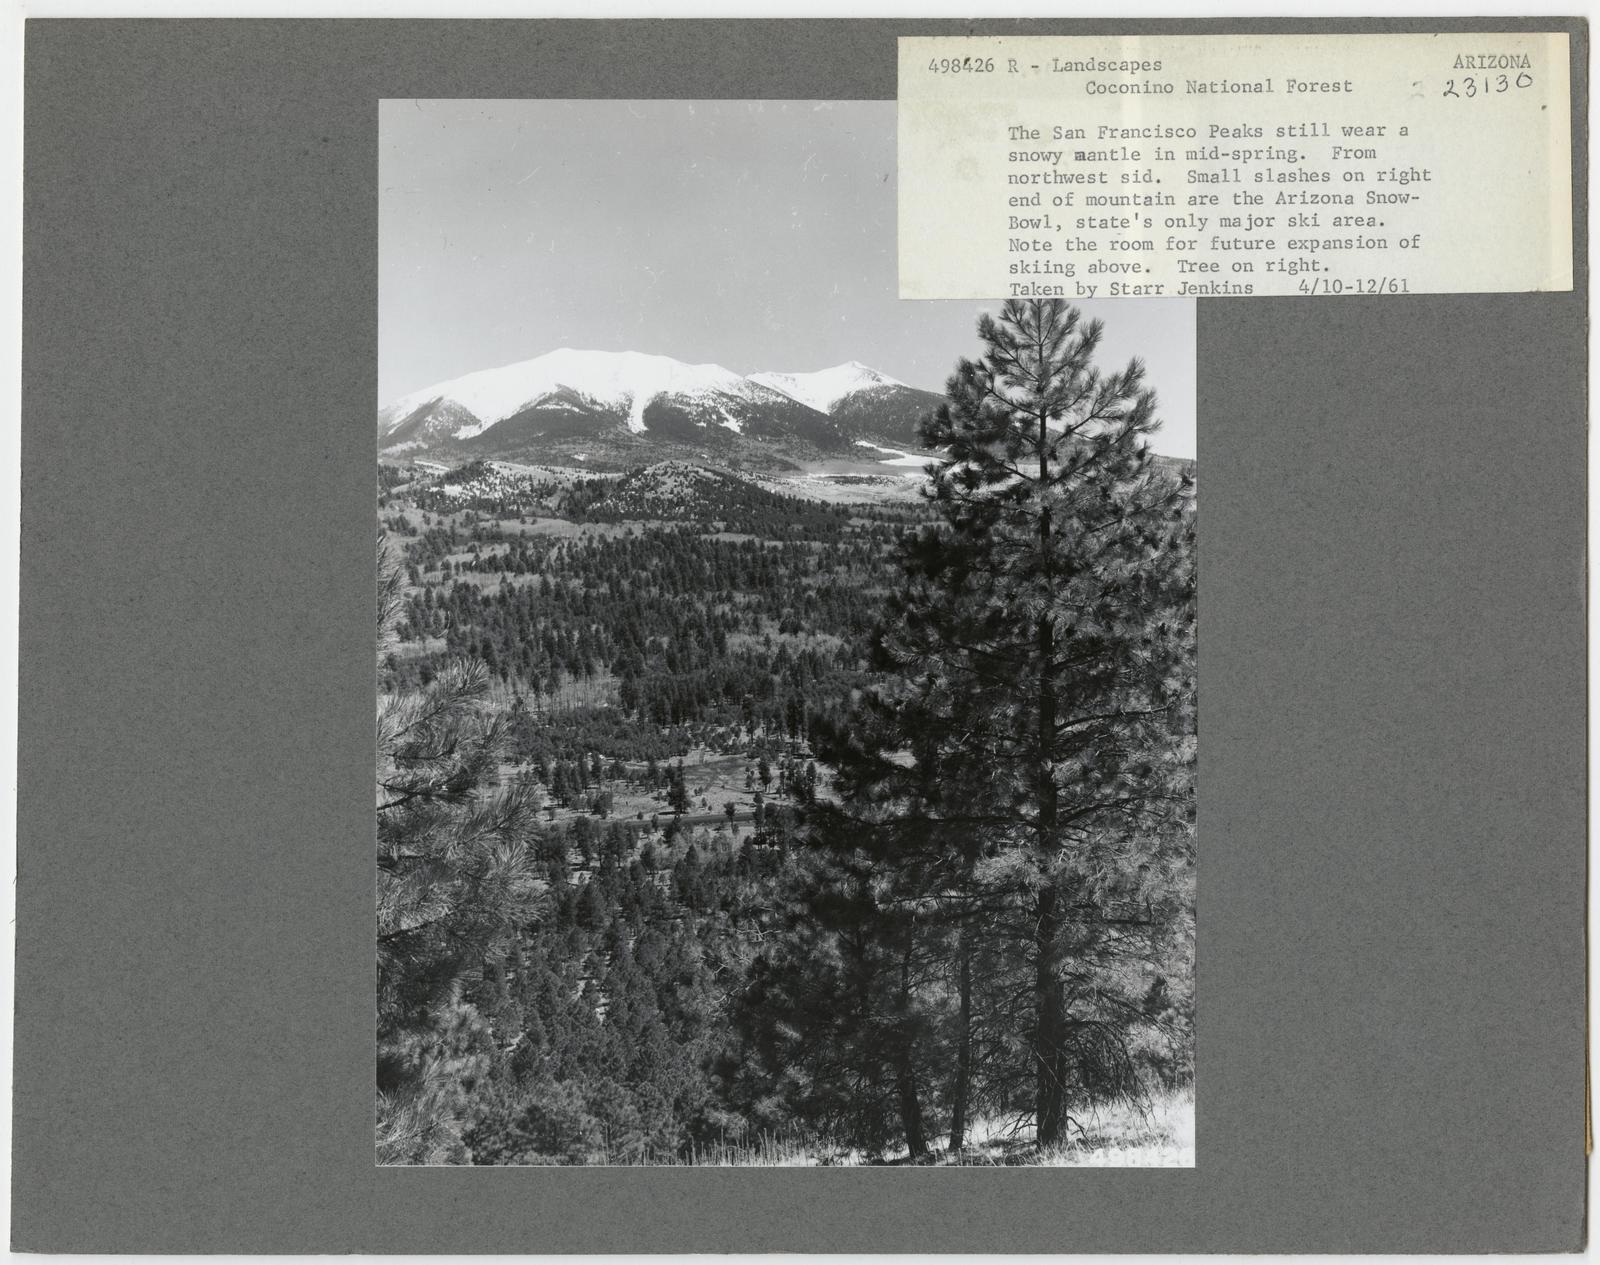 Scenery and Landscapes - Arizona